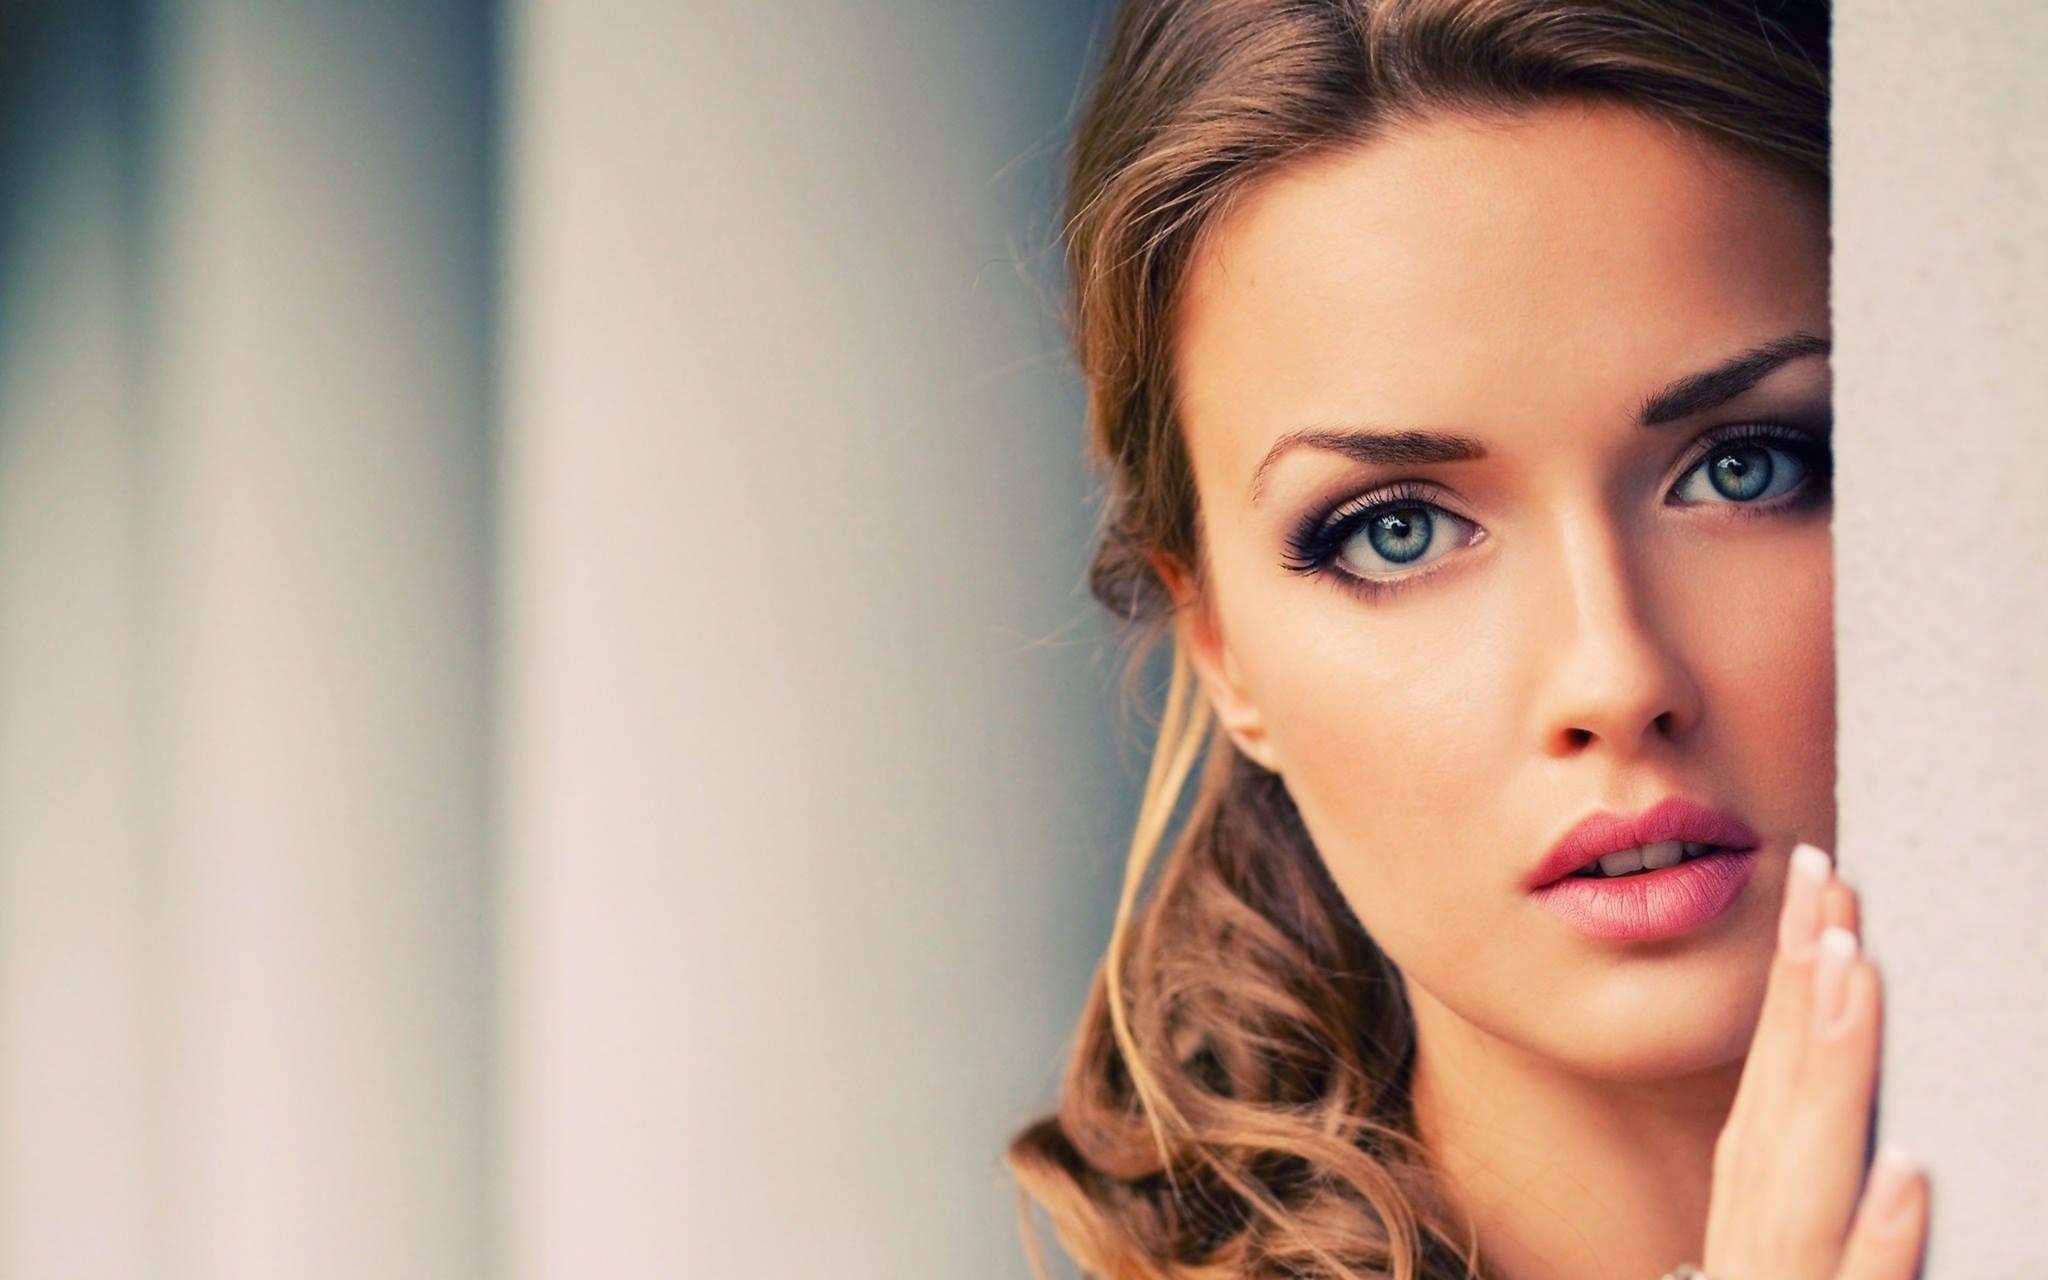 اجمل عيون 10 صور اجمل بنات و اجمل عيون